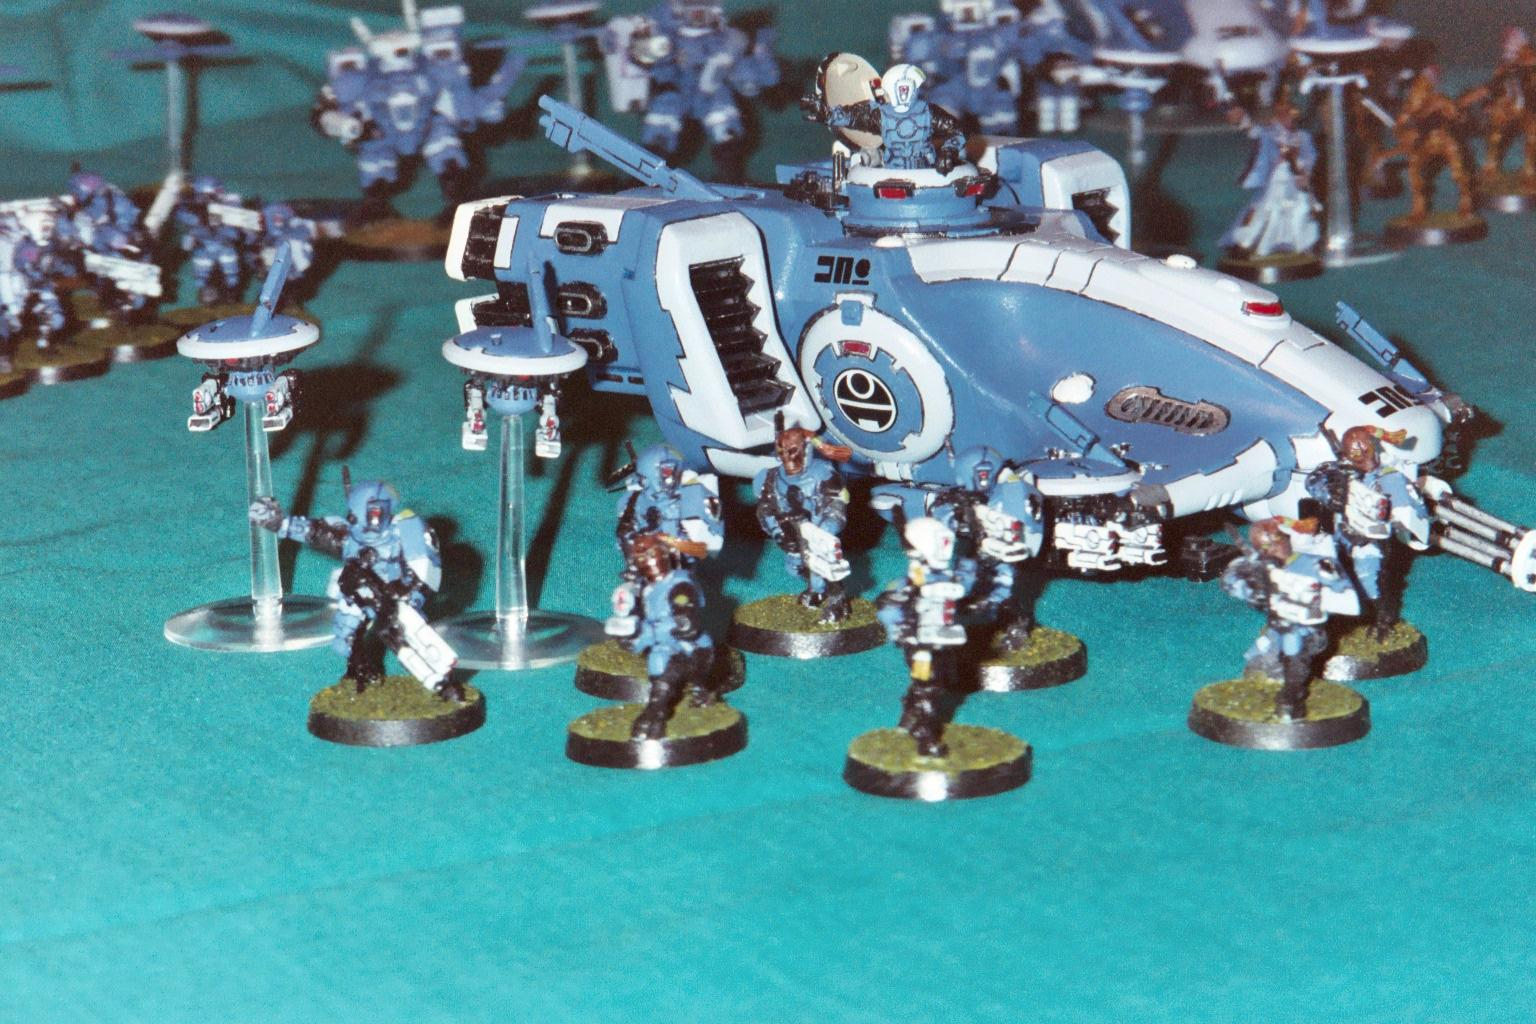 Blue, Carapace, Drone, Infantry, Pathfinders, Pulse Carbine, Tau, Transport, Unit, Warhammer 40,000